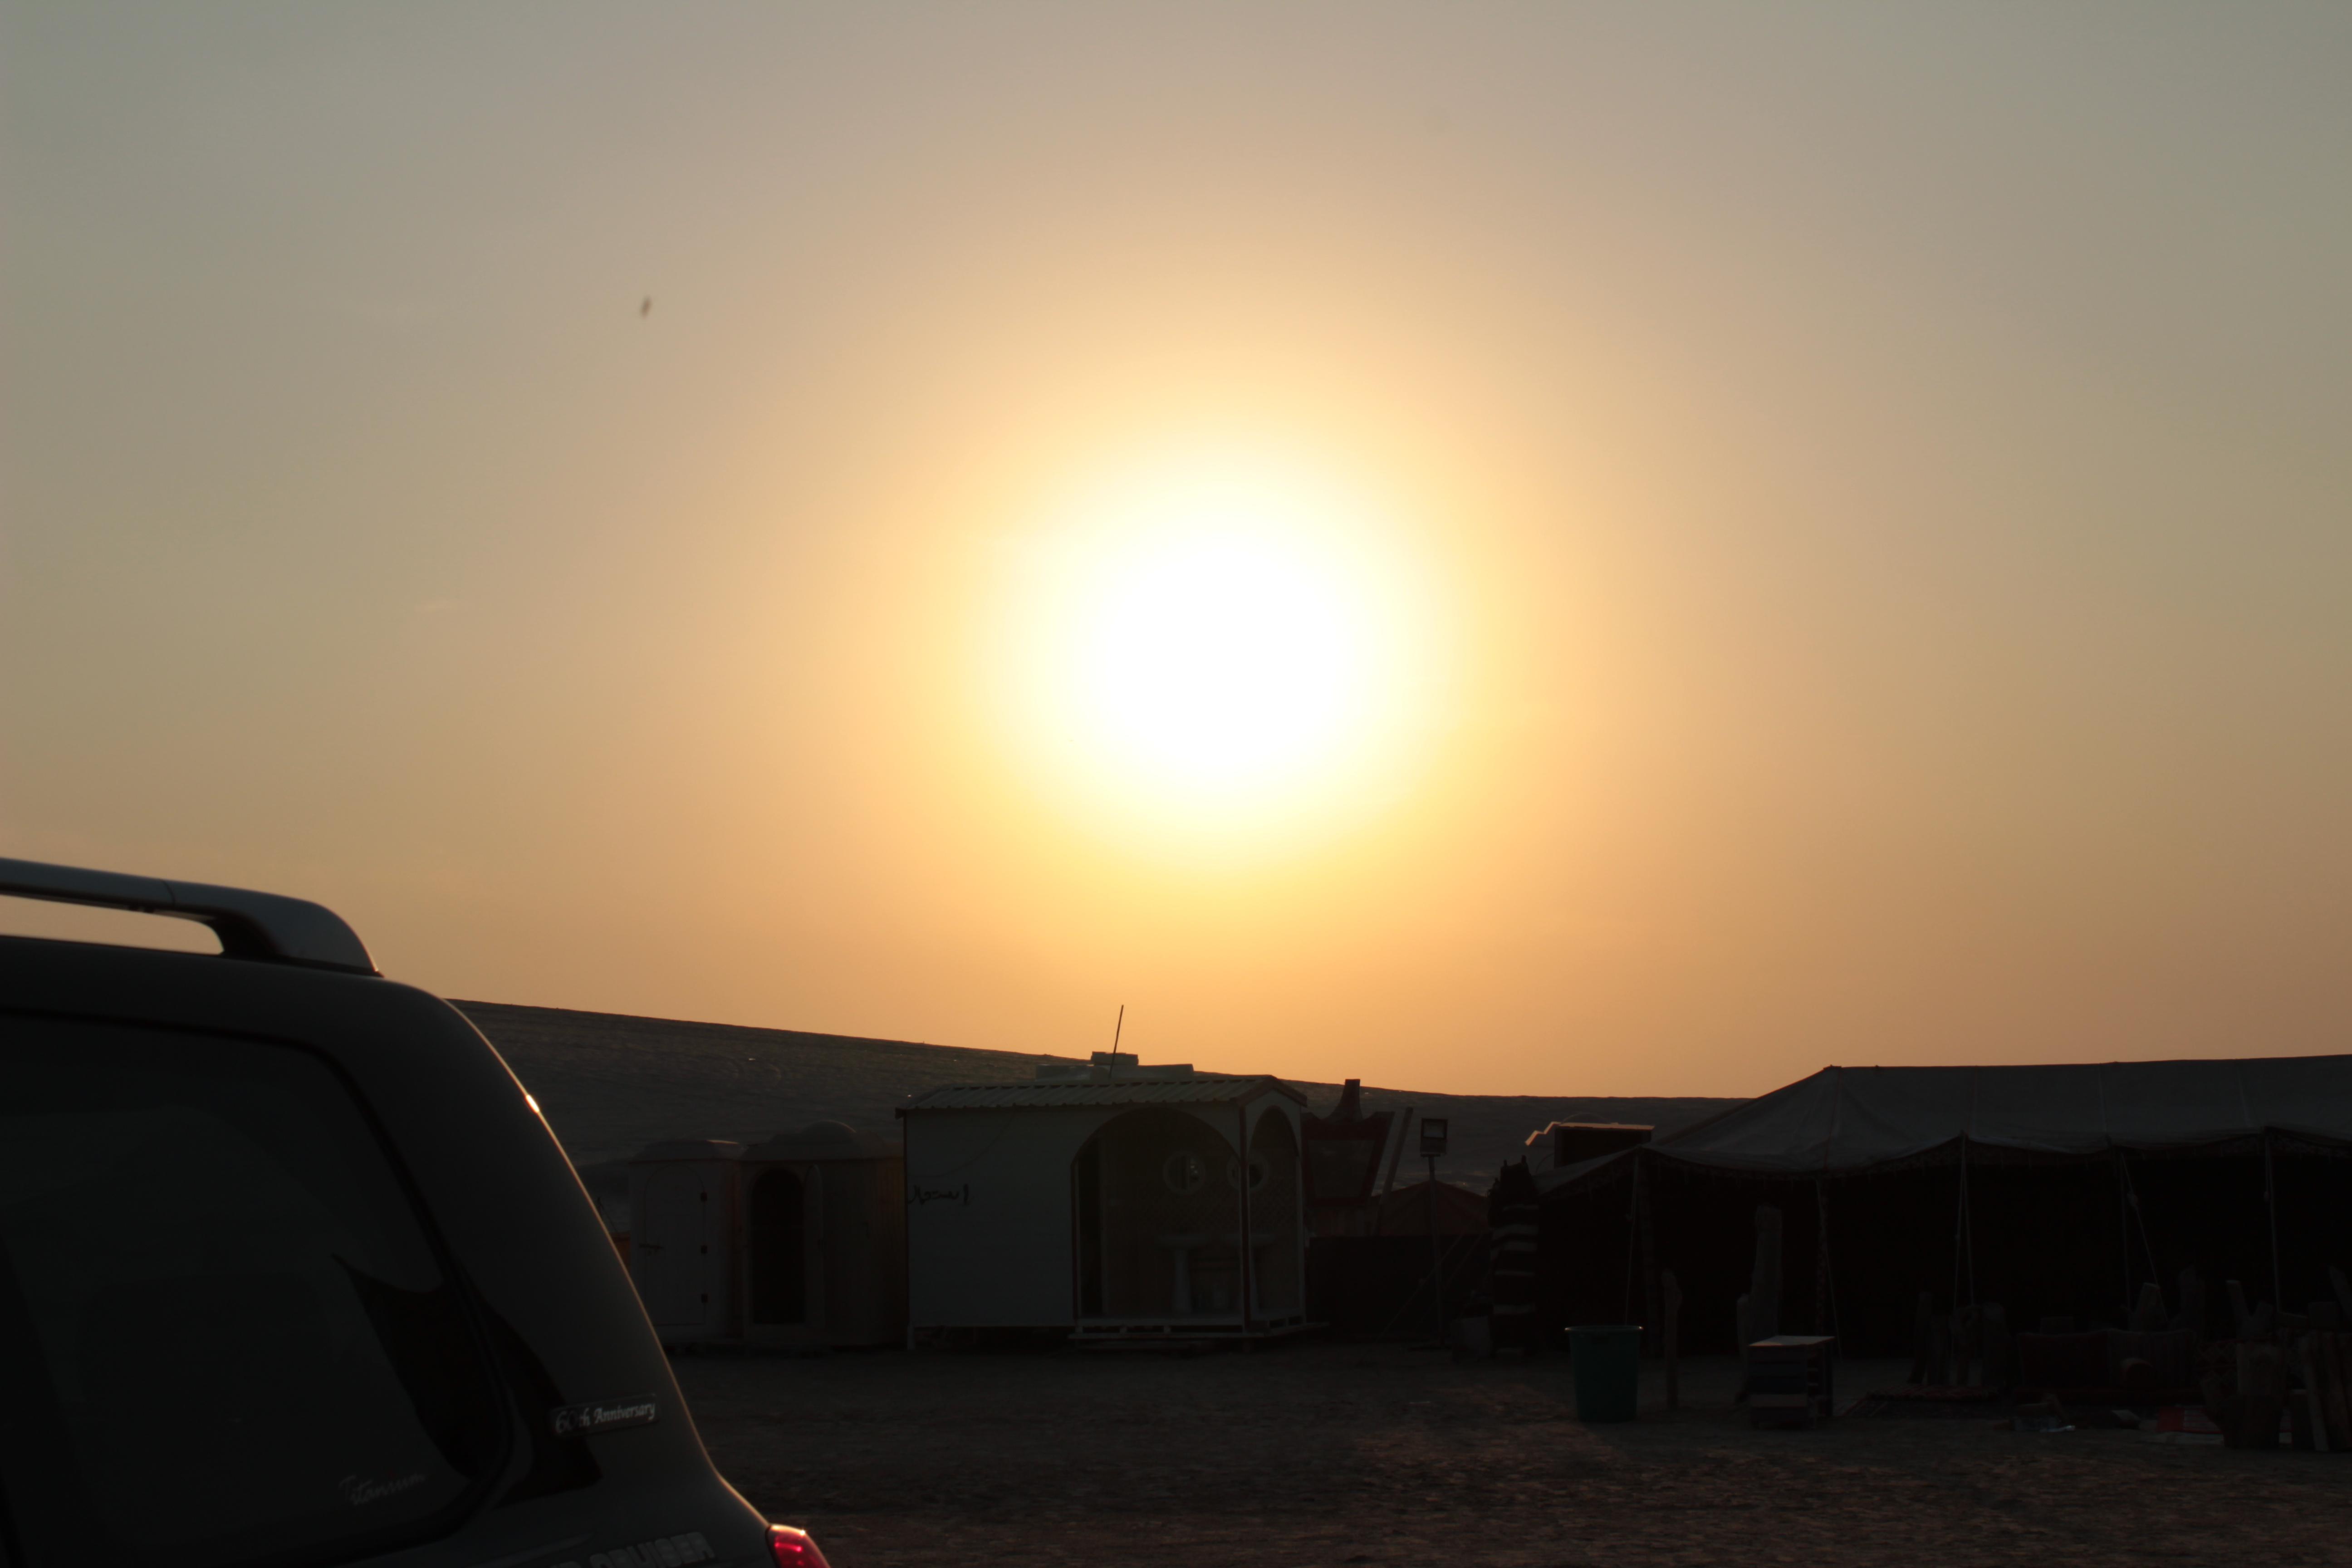 setting sun in the desert